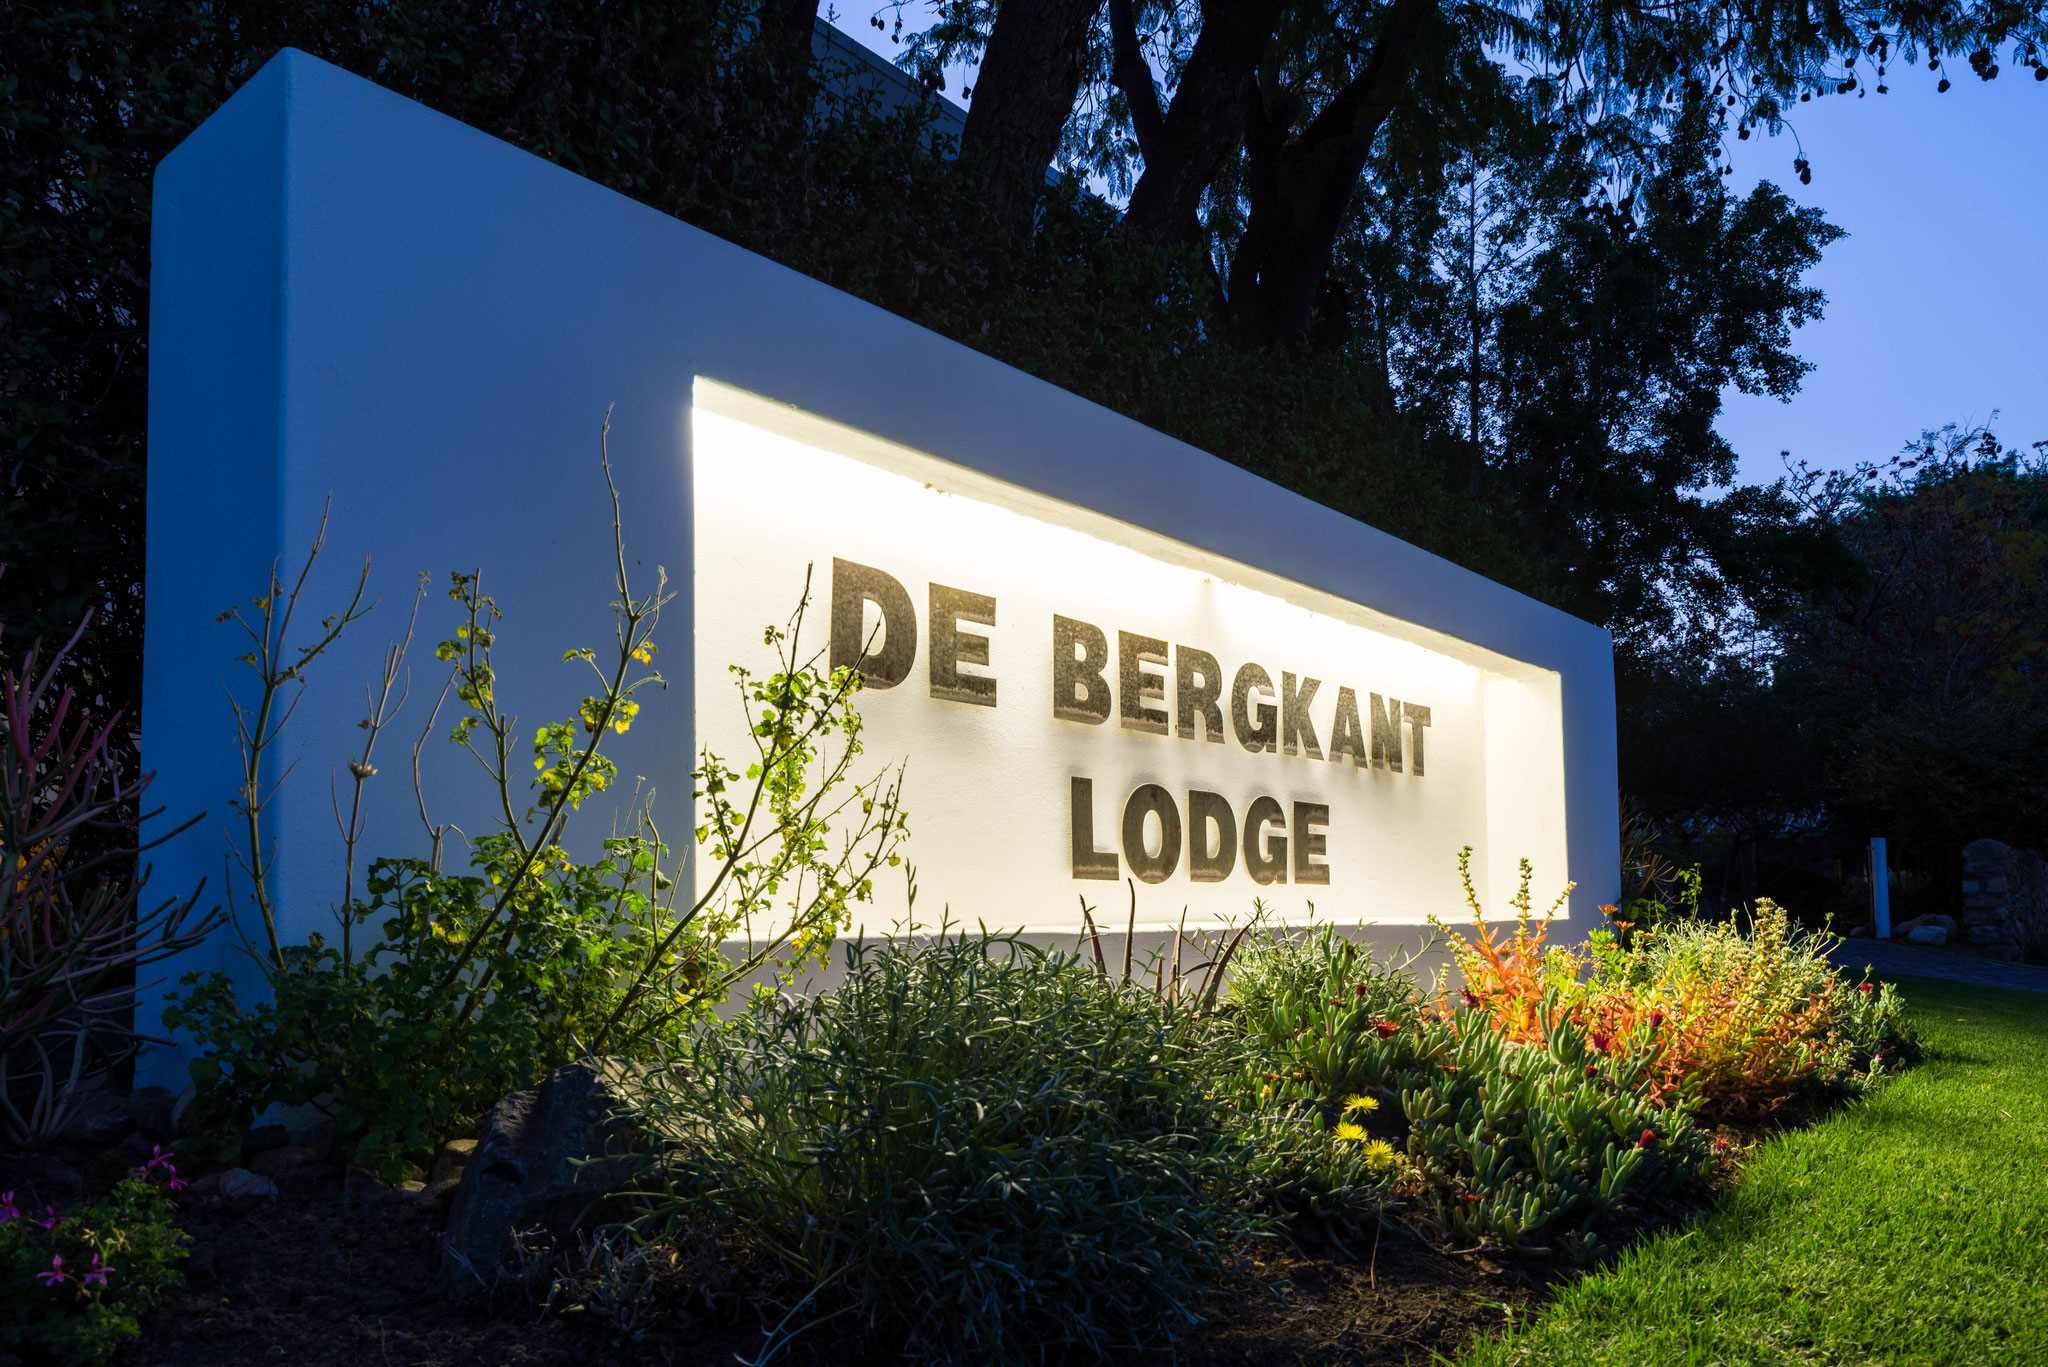 'De Bergkant Lodge' Entrance Sign